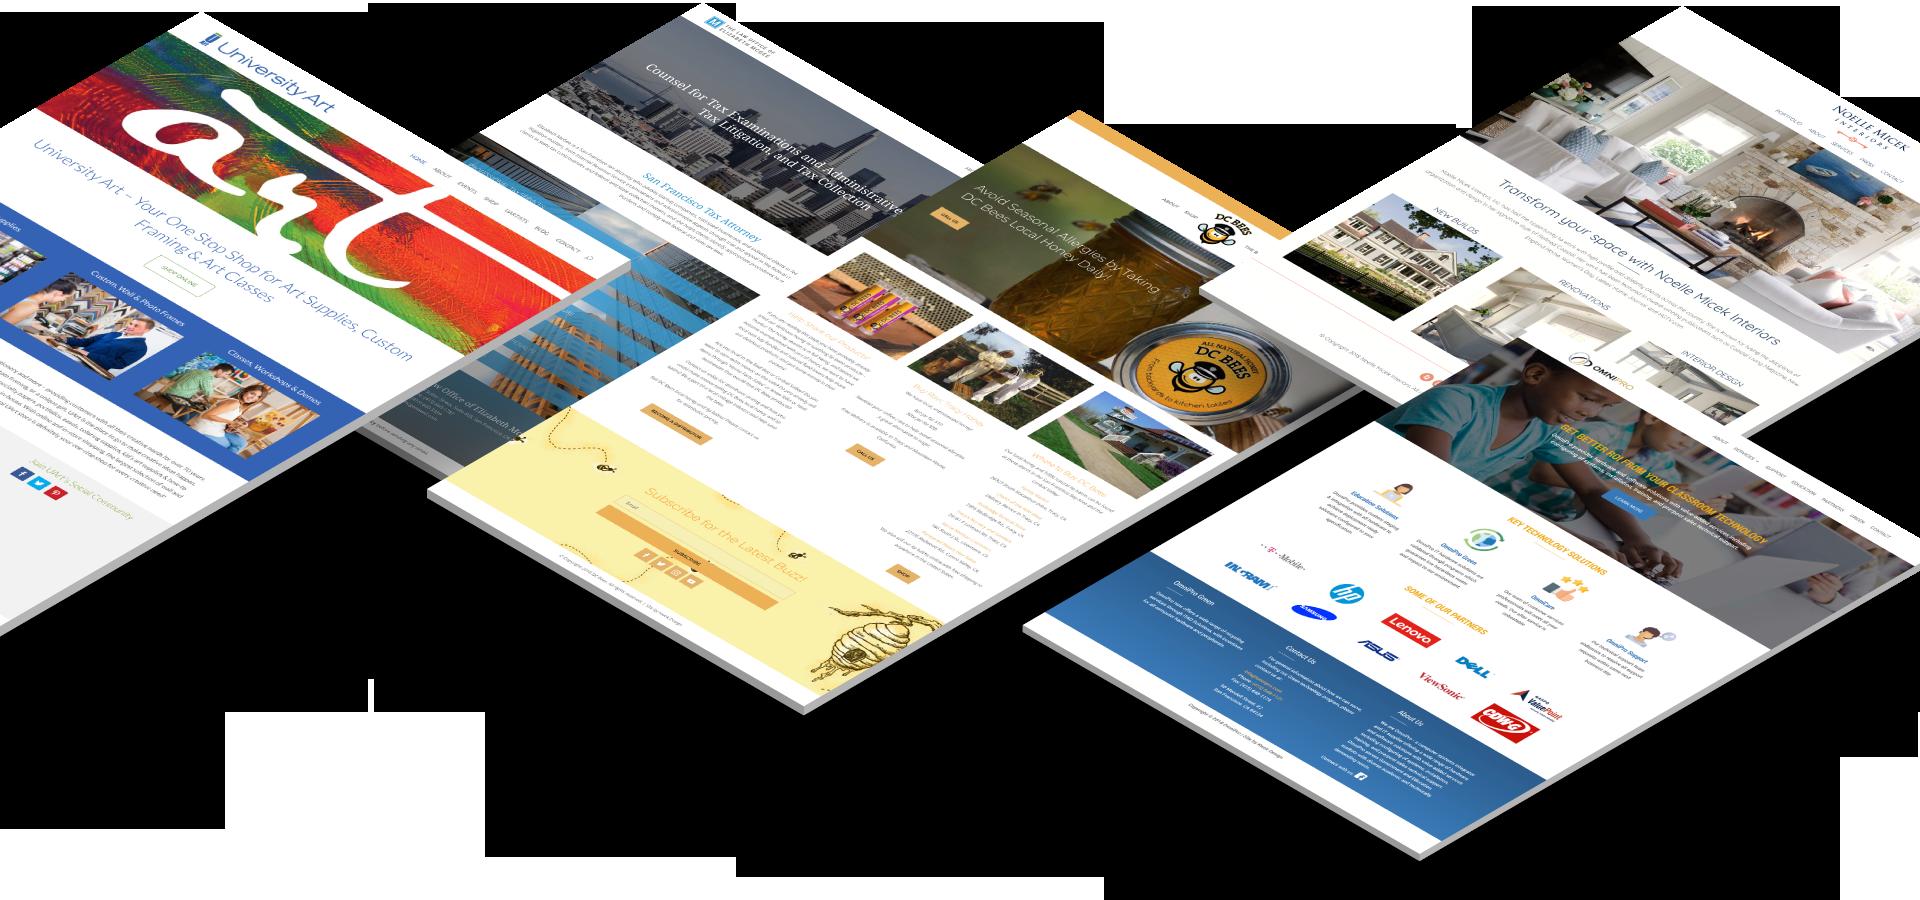 Kwok Design Provides A High Quality Web Designing Services In San Francisco We Have A Professional San Jose Website Design Company Web Development Web Design